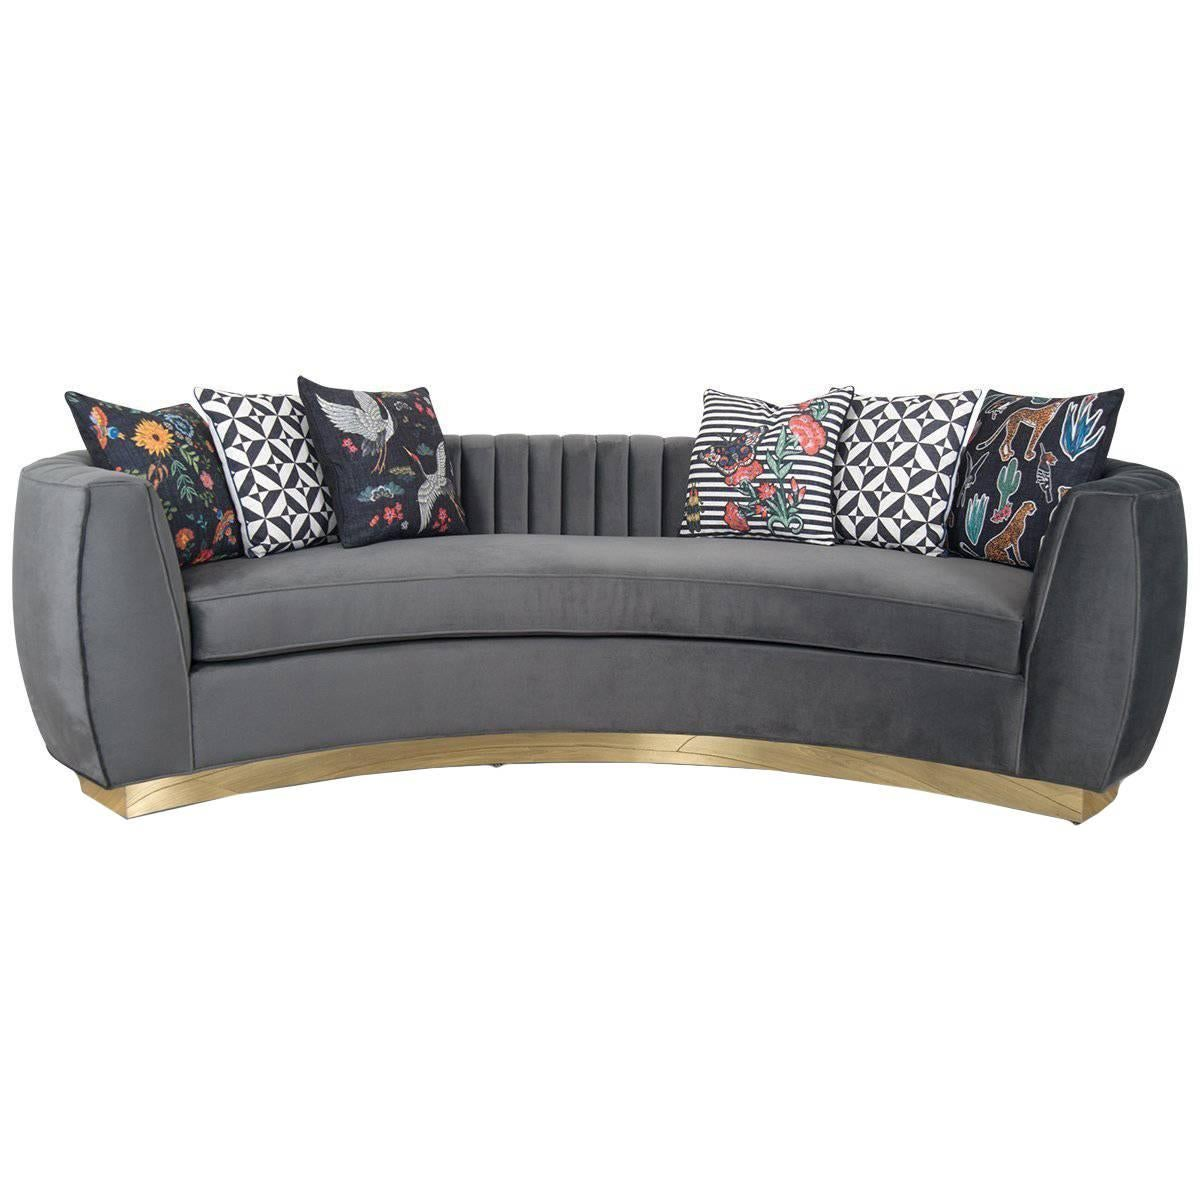 Modern Art Deco Style Sofa And Long Arm Tufting Charcoal Velvet U0026 Gold Toe  Kick